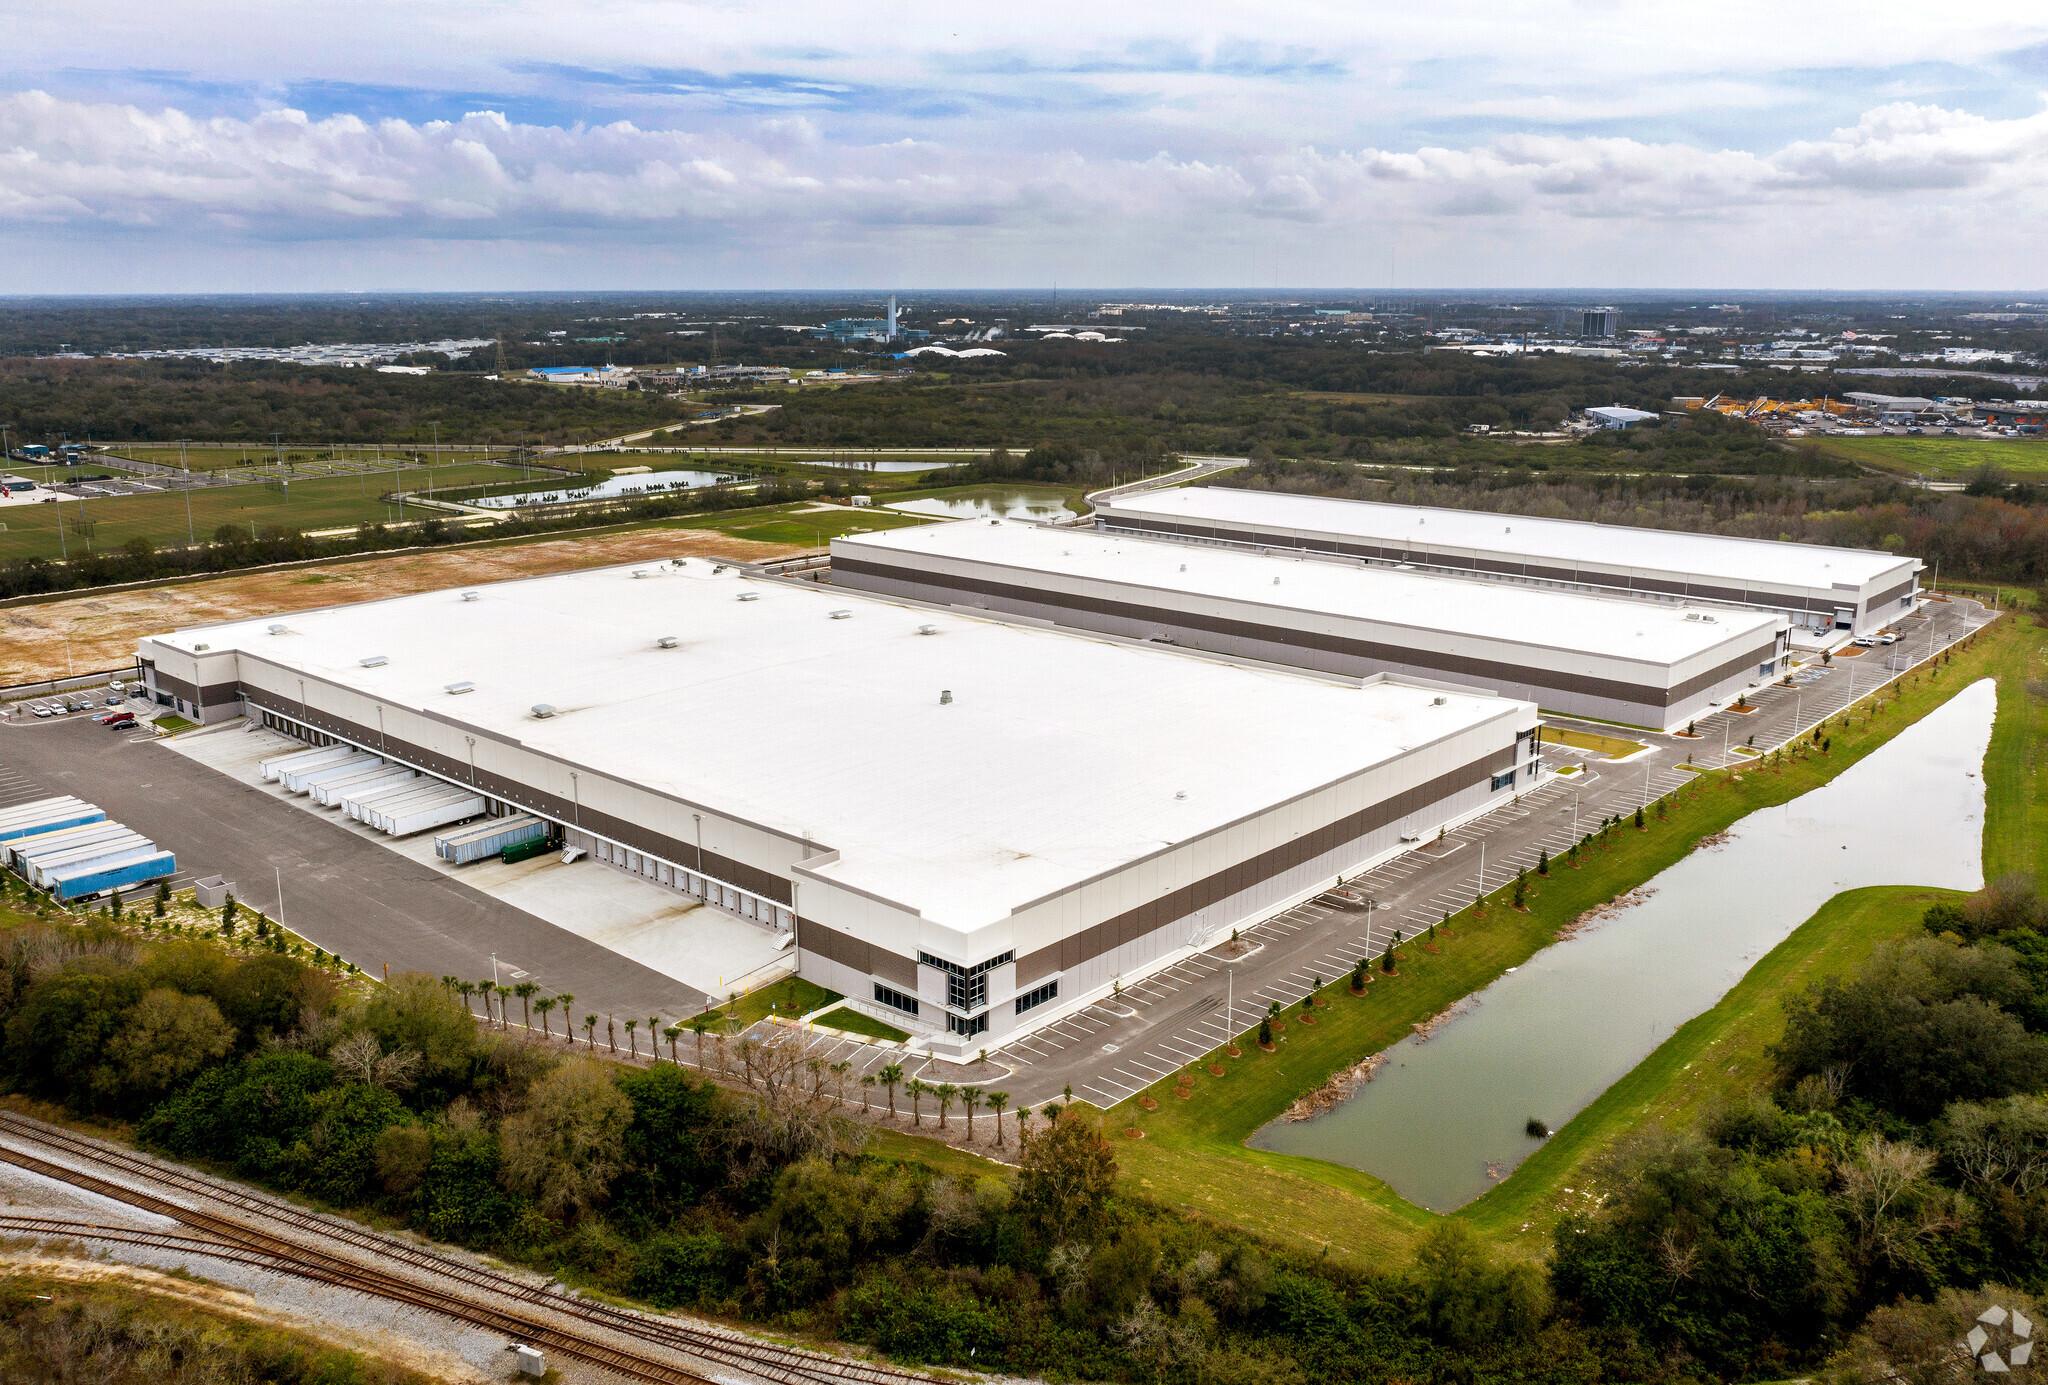 Commercial Roof Installer • Tampa, FL